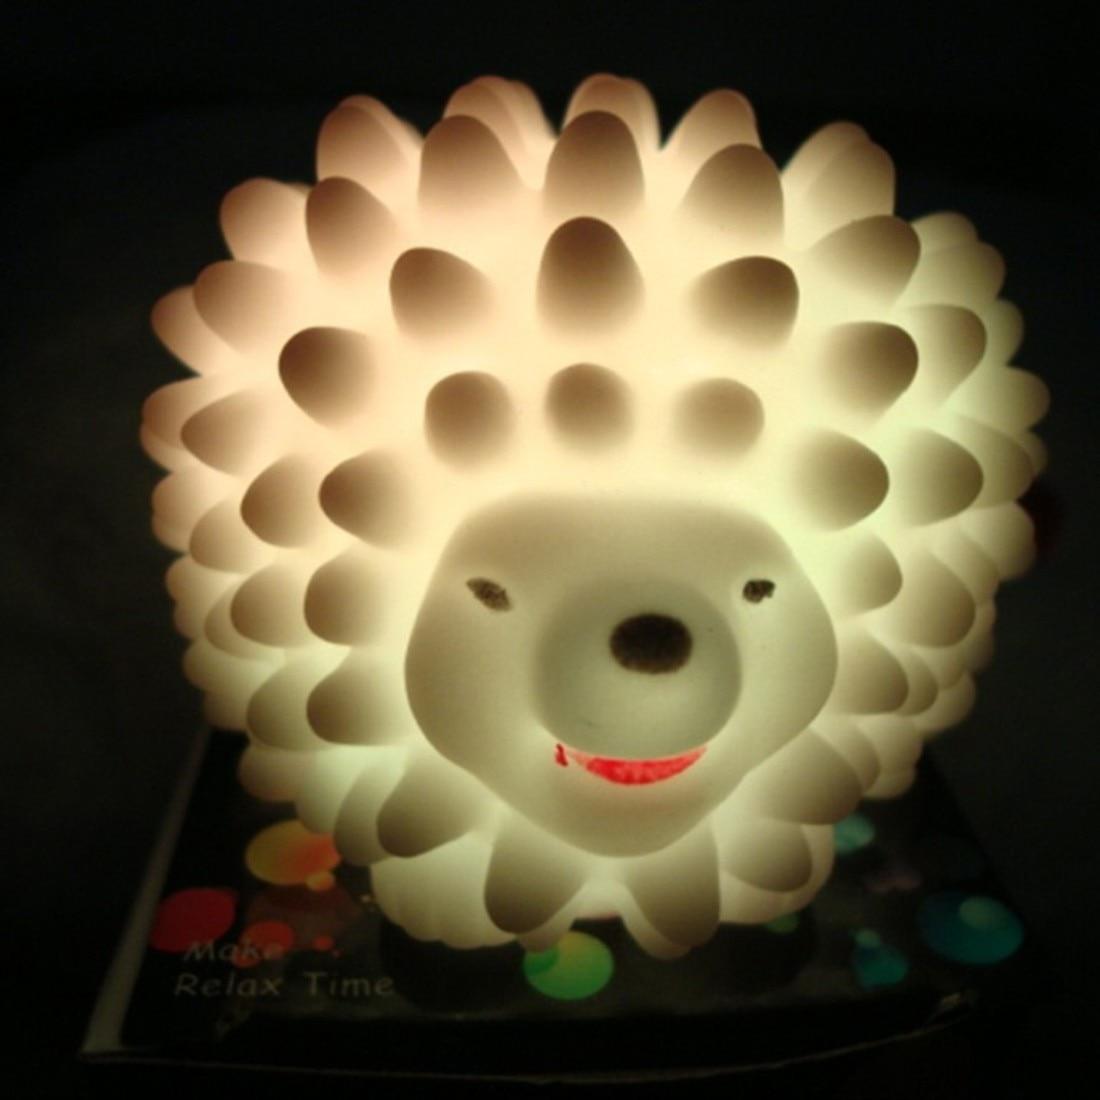 LED Hedgehog Night Light Lamp Desk Lamp Changeable-color Christmas Present Baby Light Home LED Bedside Light Lamp